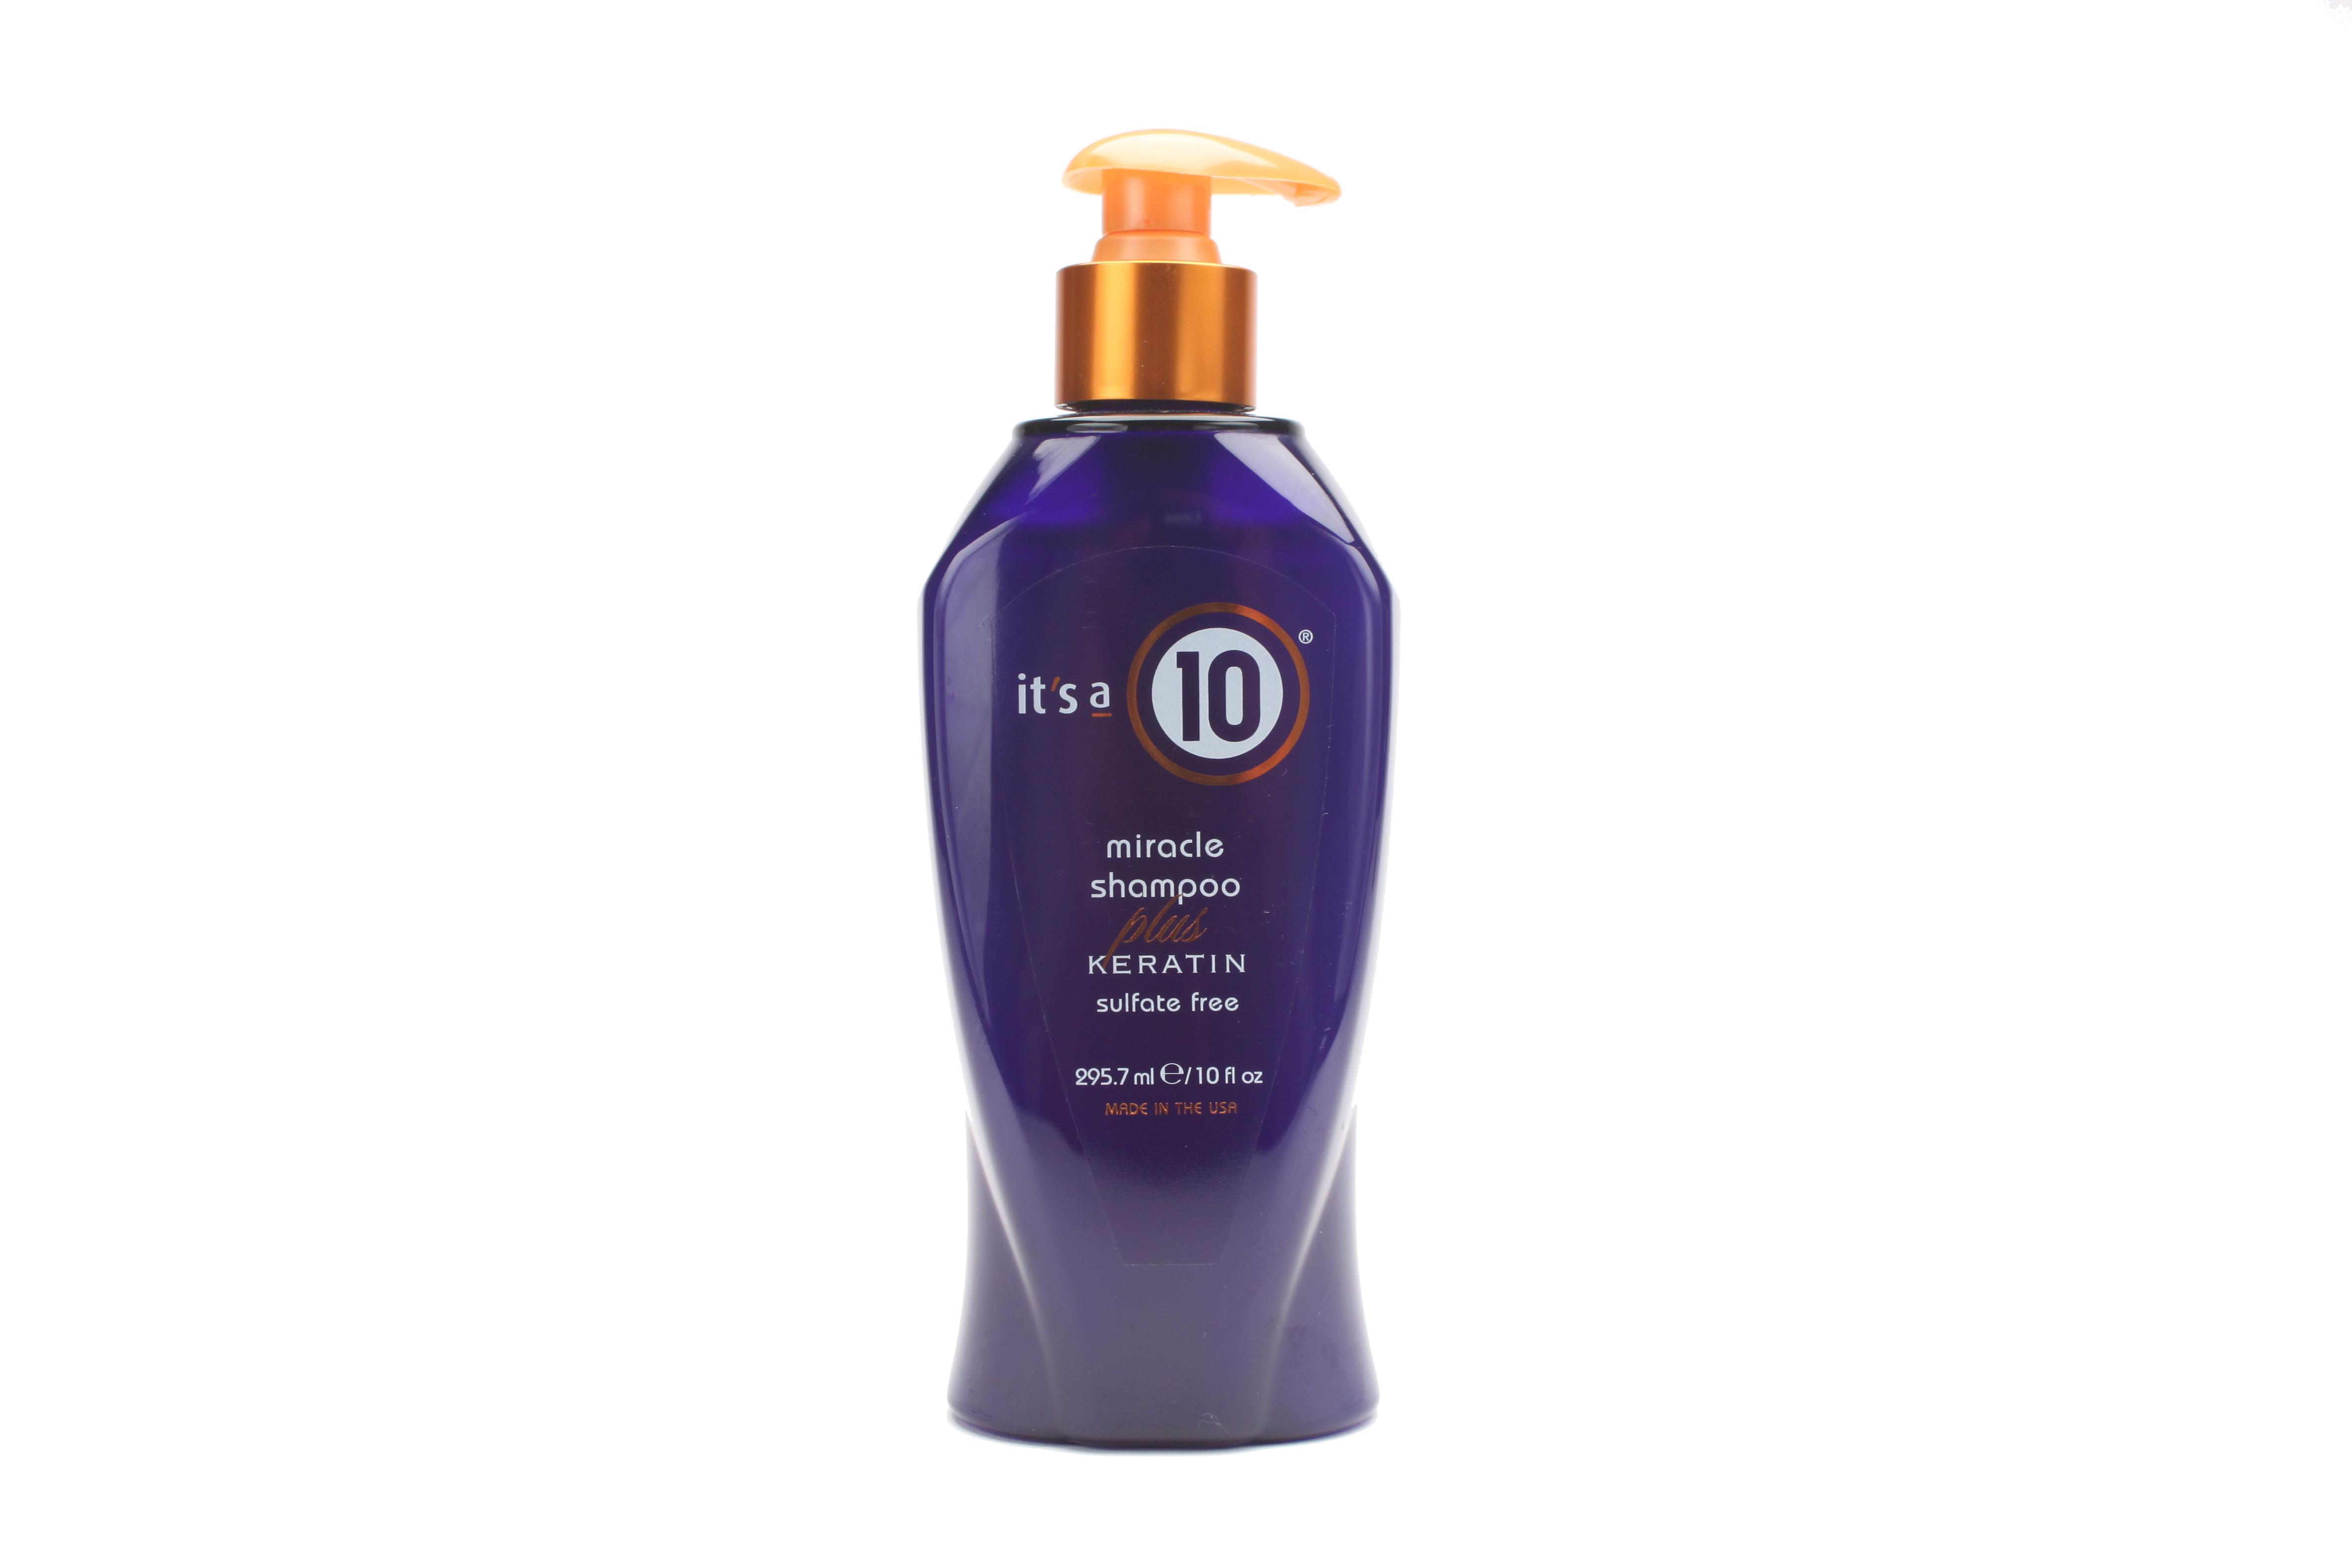 58558 Shampoo Plus Keratin 10 oz Front